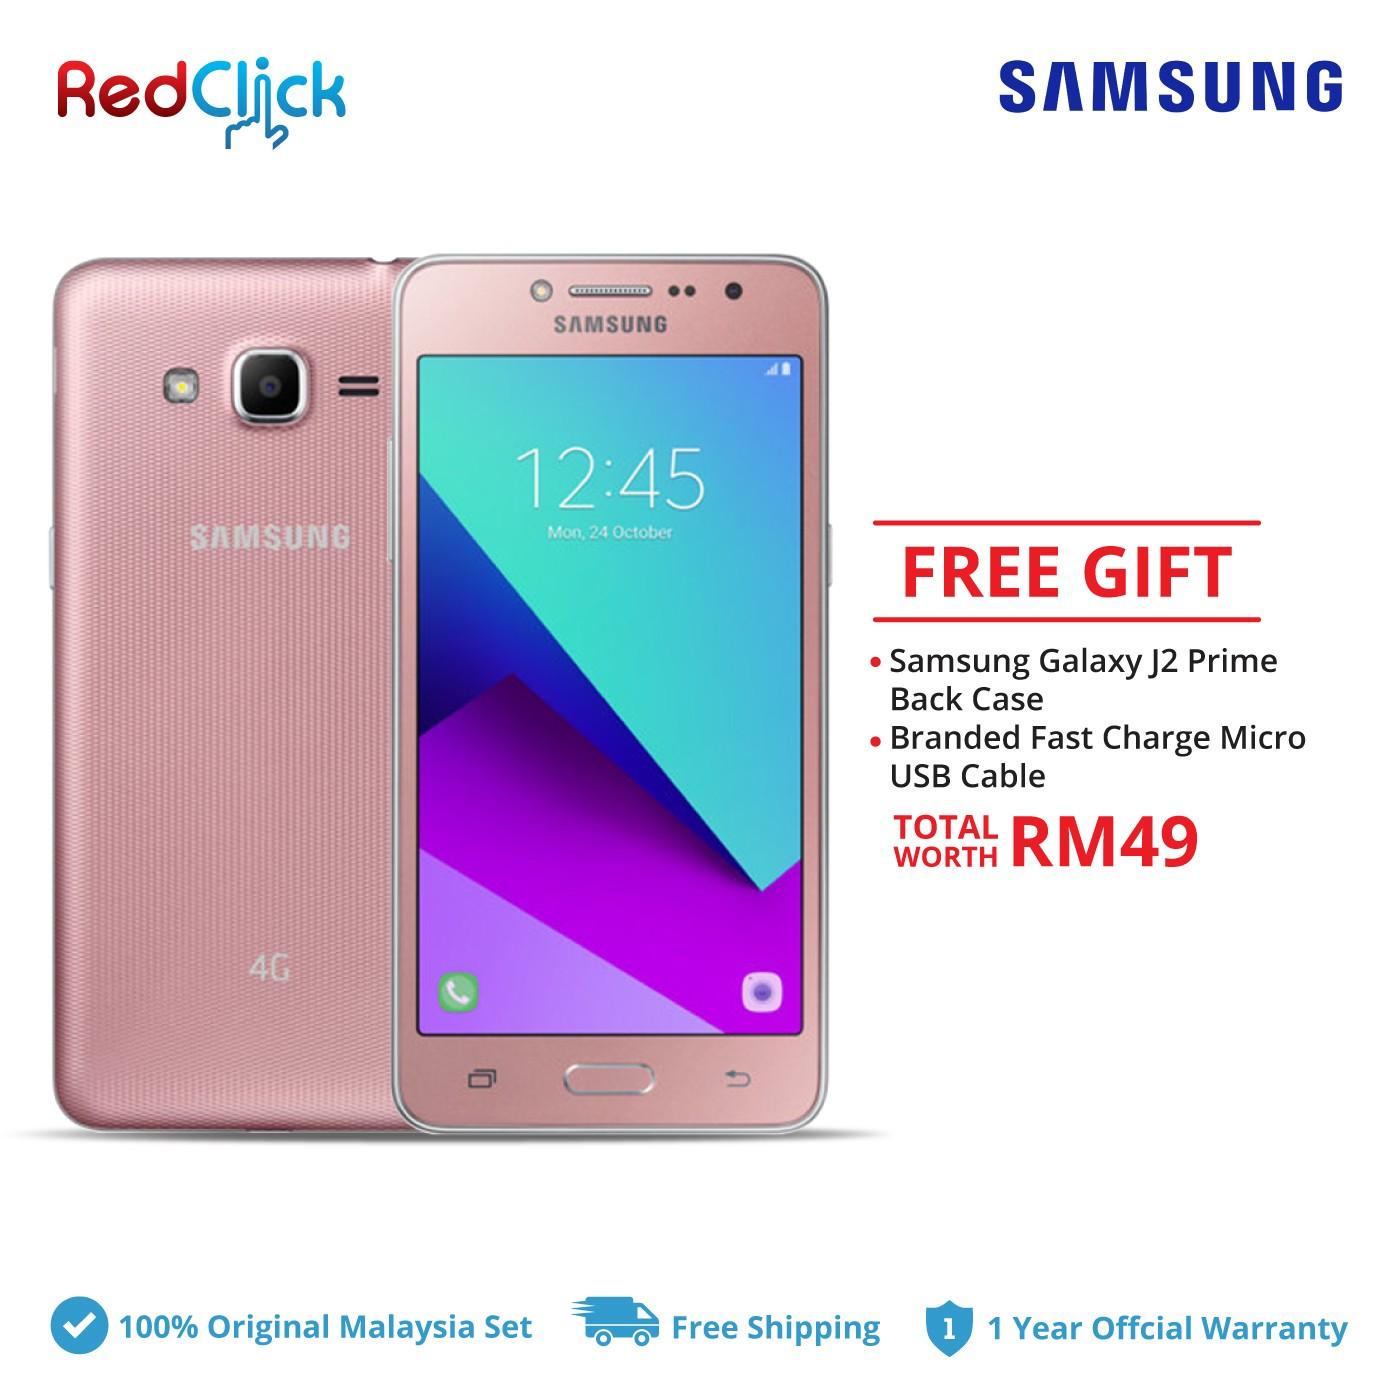 Samsung Galaxy J2 Prime/g532g 8GB Original Samsung Malaysia Set + 2 Free Gift Worth